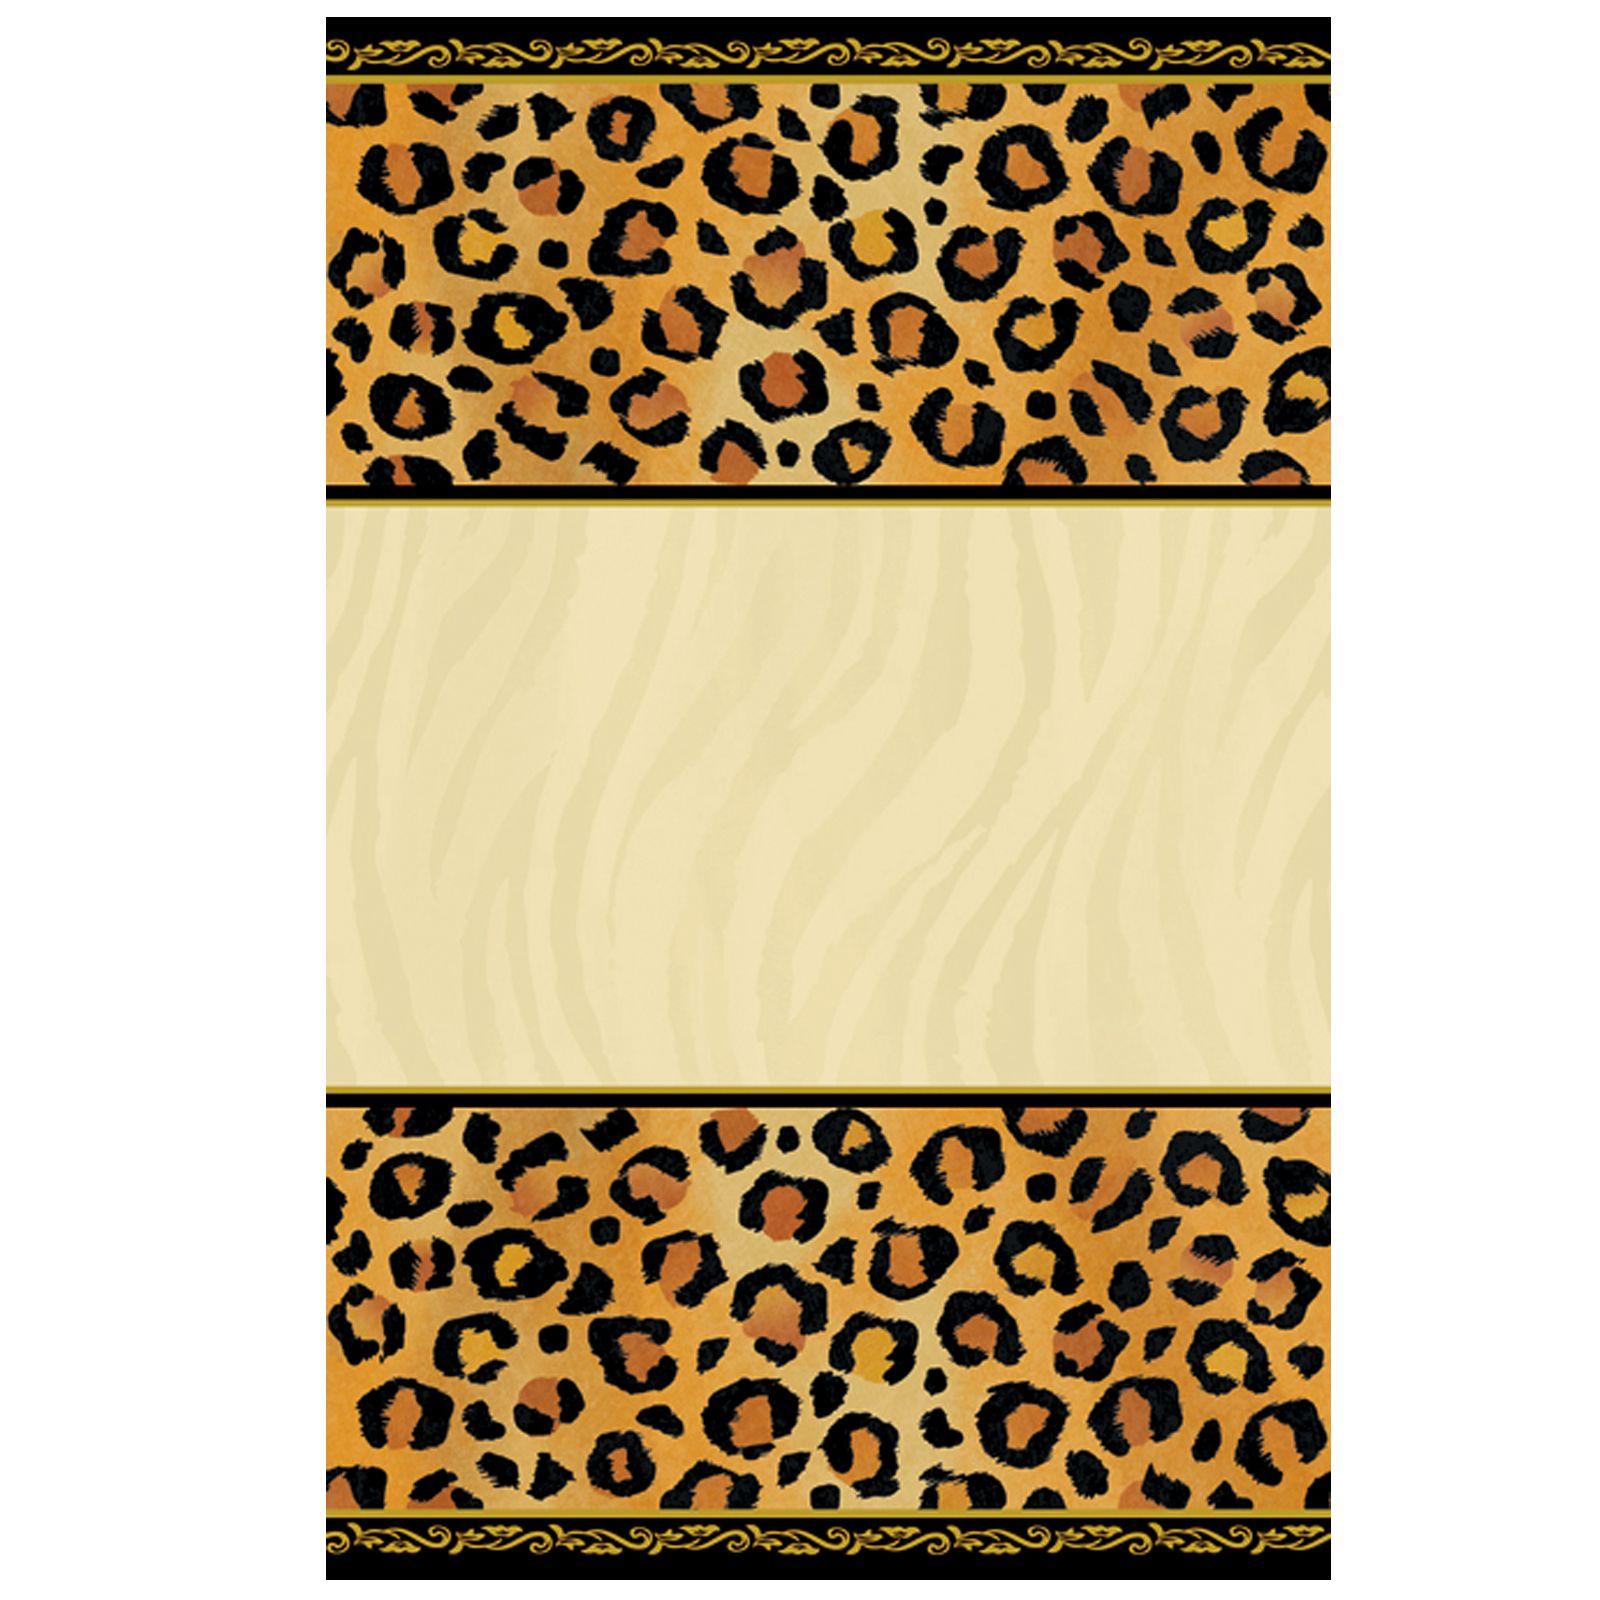 Leopard Print Invitations Printable Free cakepins.com | Printables ...